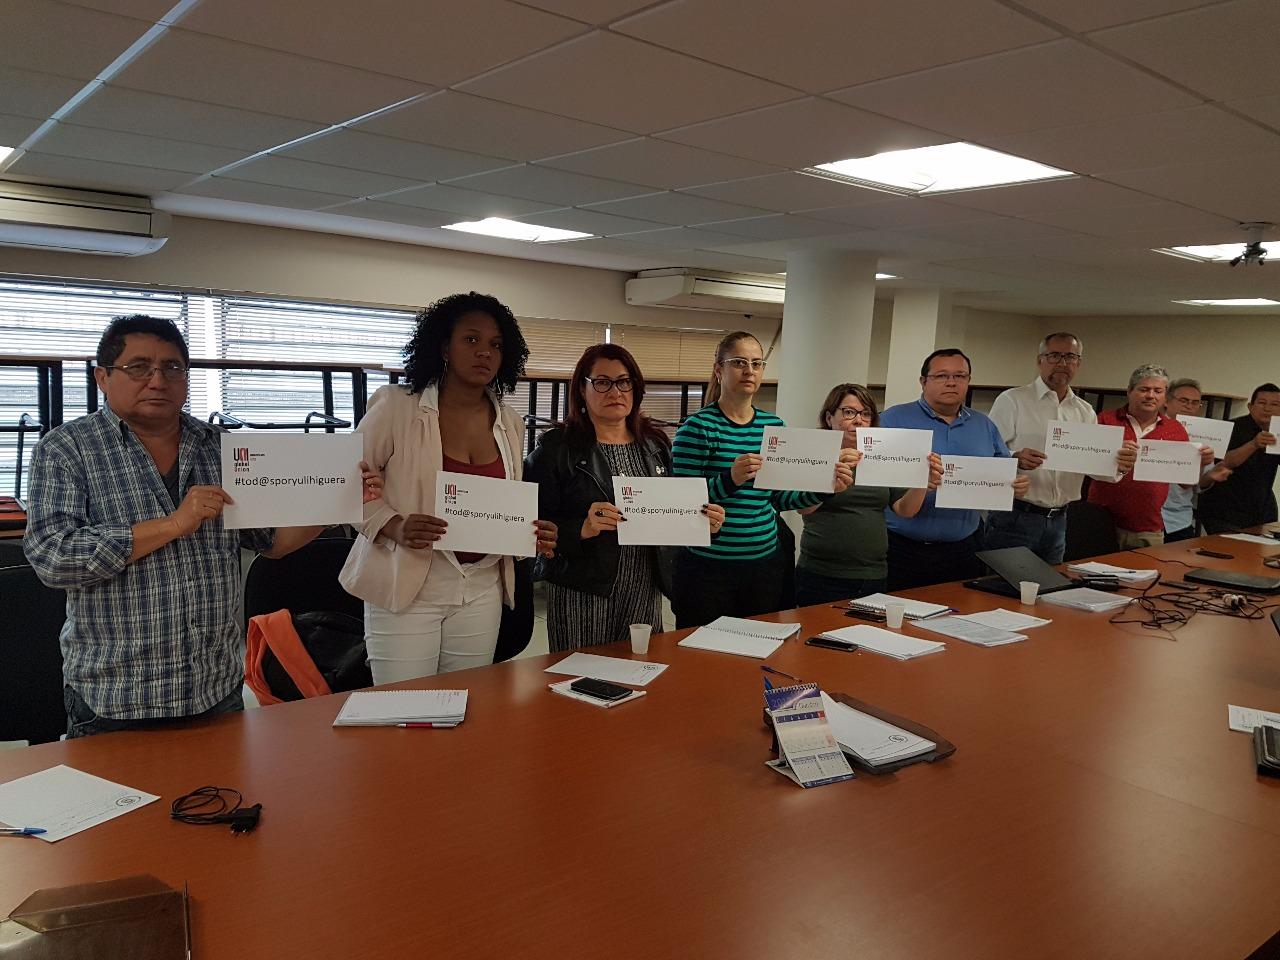 Sinttel e Fenattel se solidarizam com sindicalista colombiana e pedem apoio ao presidente da Claro